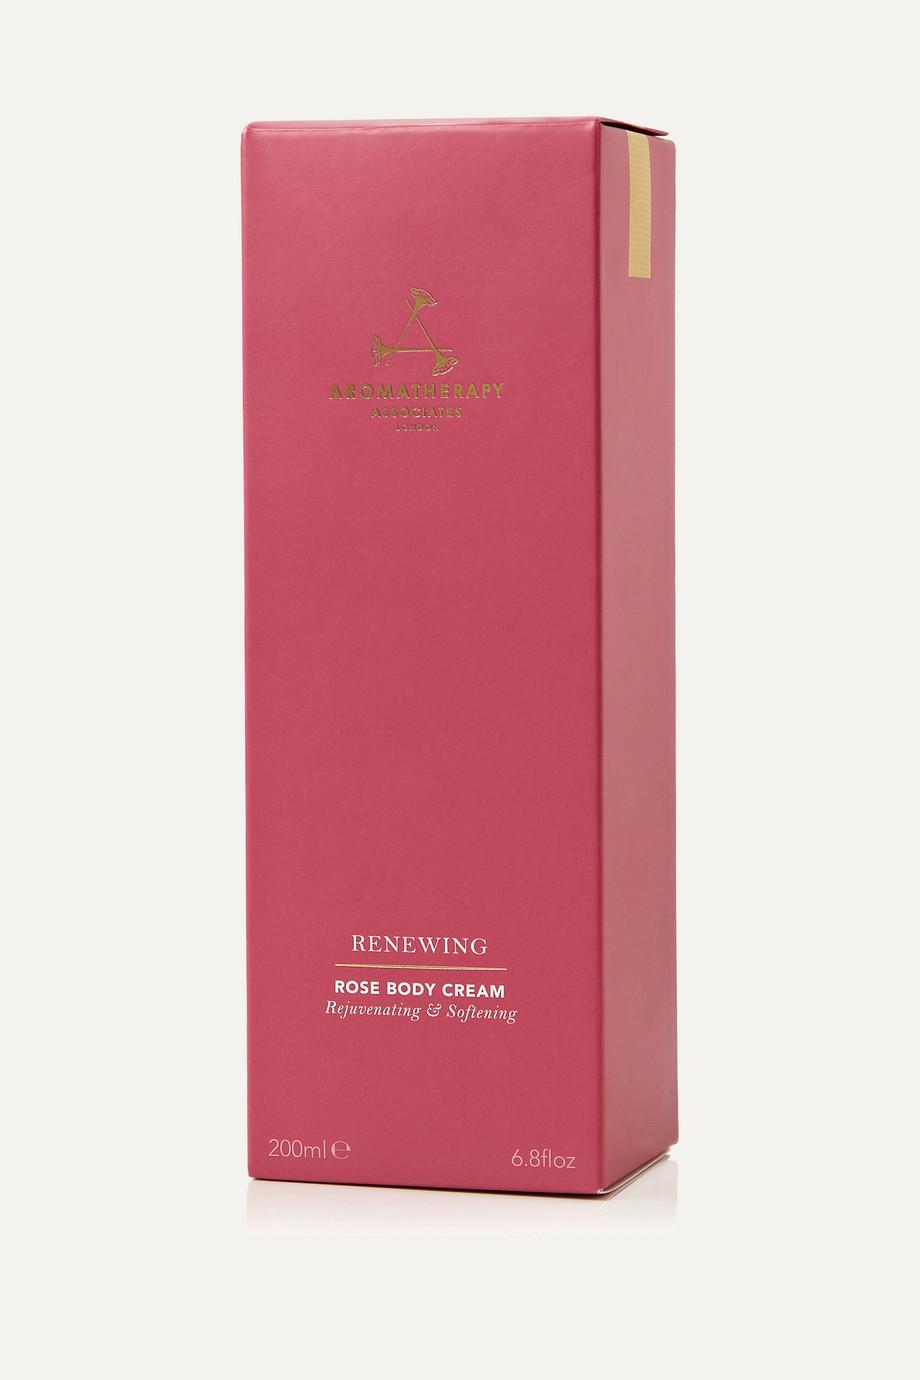 Aromatherapy Associates 焕肤玫瑰身体乳,200ml